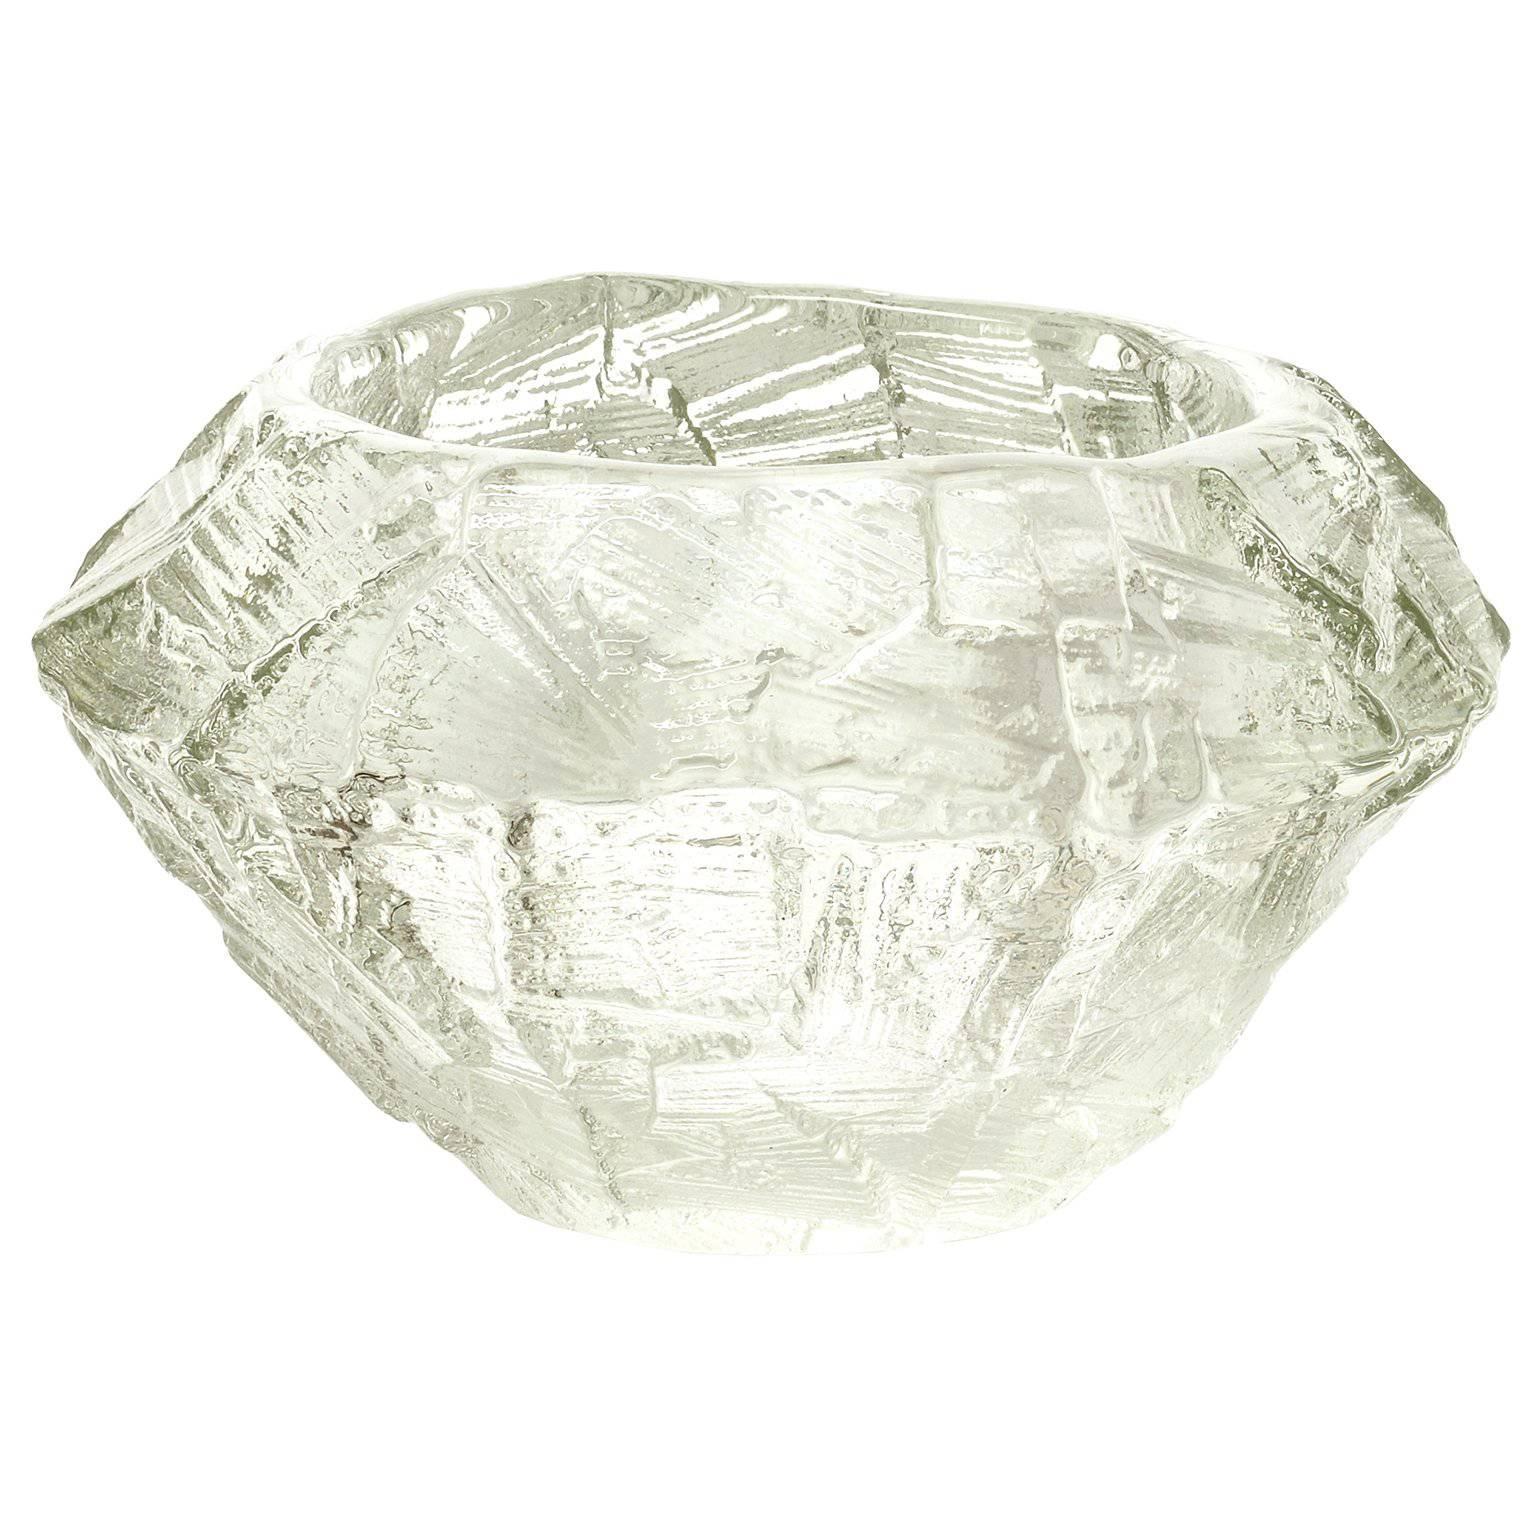 Gore Augustsson for Ruda, Scandinavian Modern Mid-Century Clear Glass Bowl